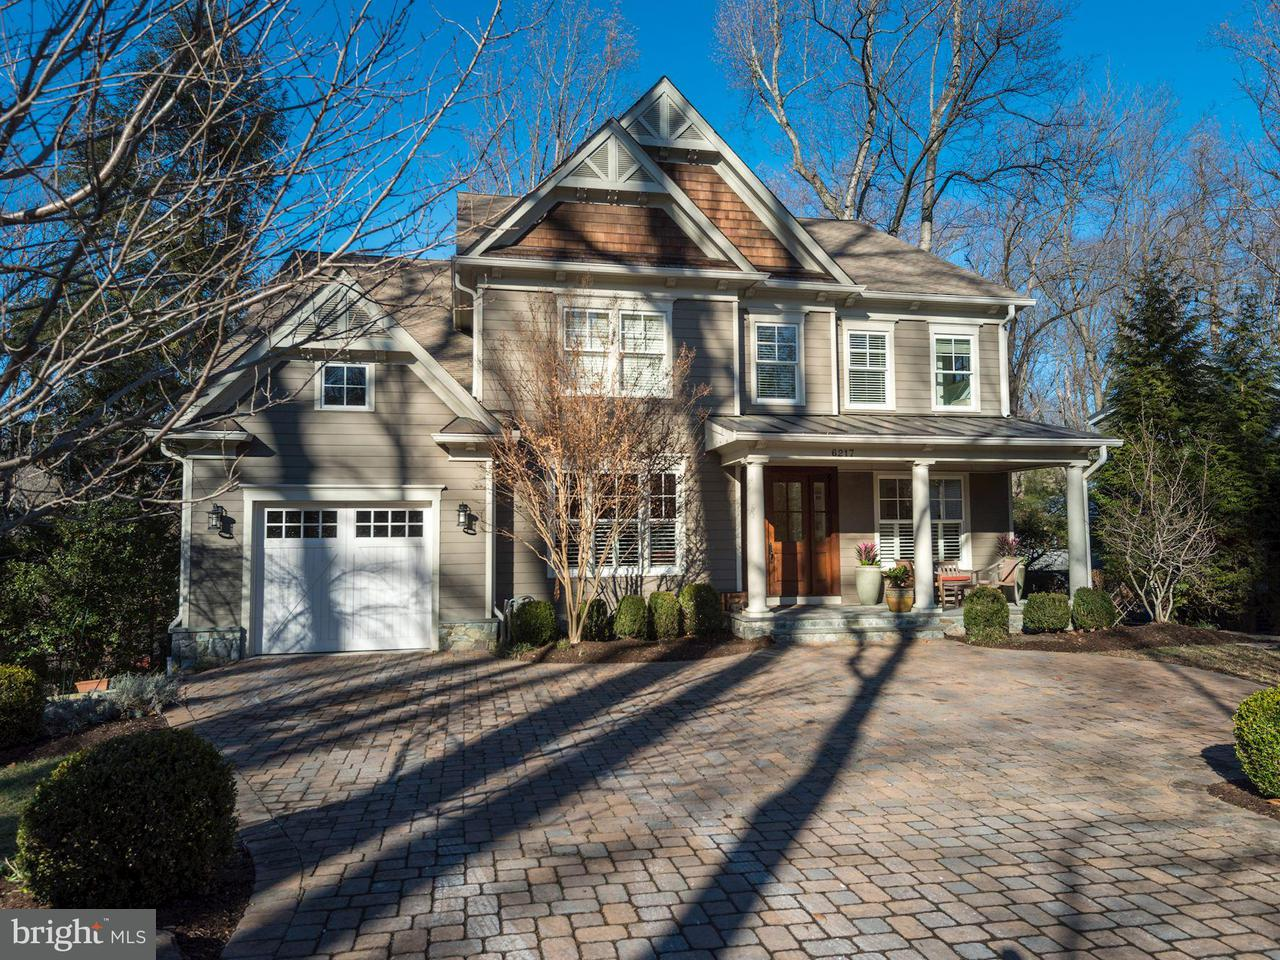 Single Family Home for Sale at 6217 Winnebago Road 6217 Winnebago Road Bethesda, Maryland 20816 United States